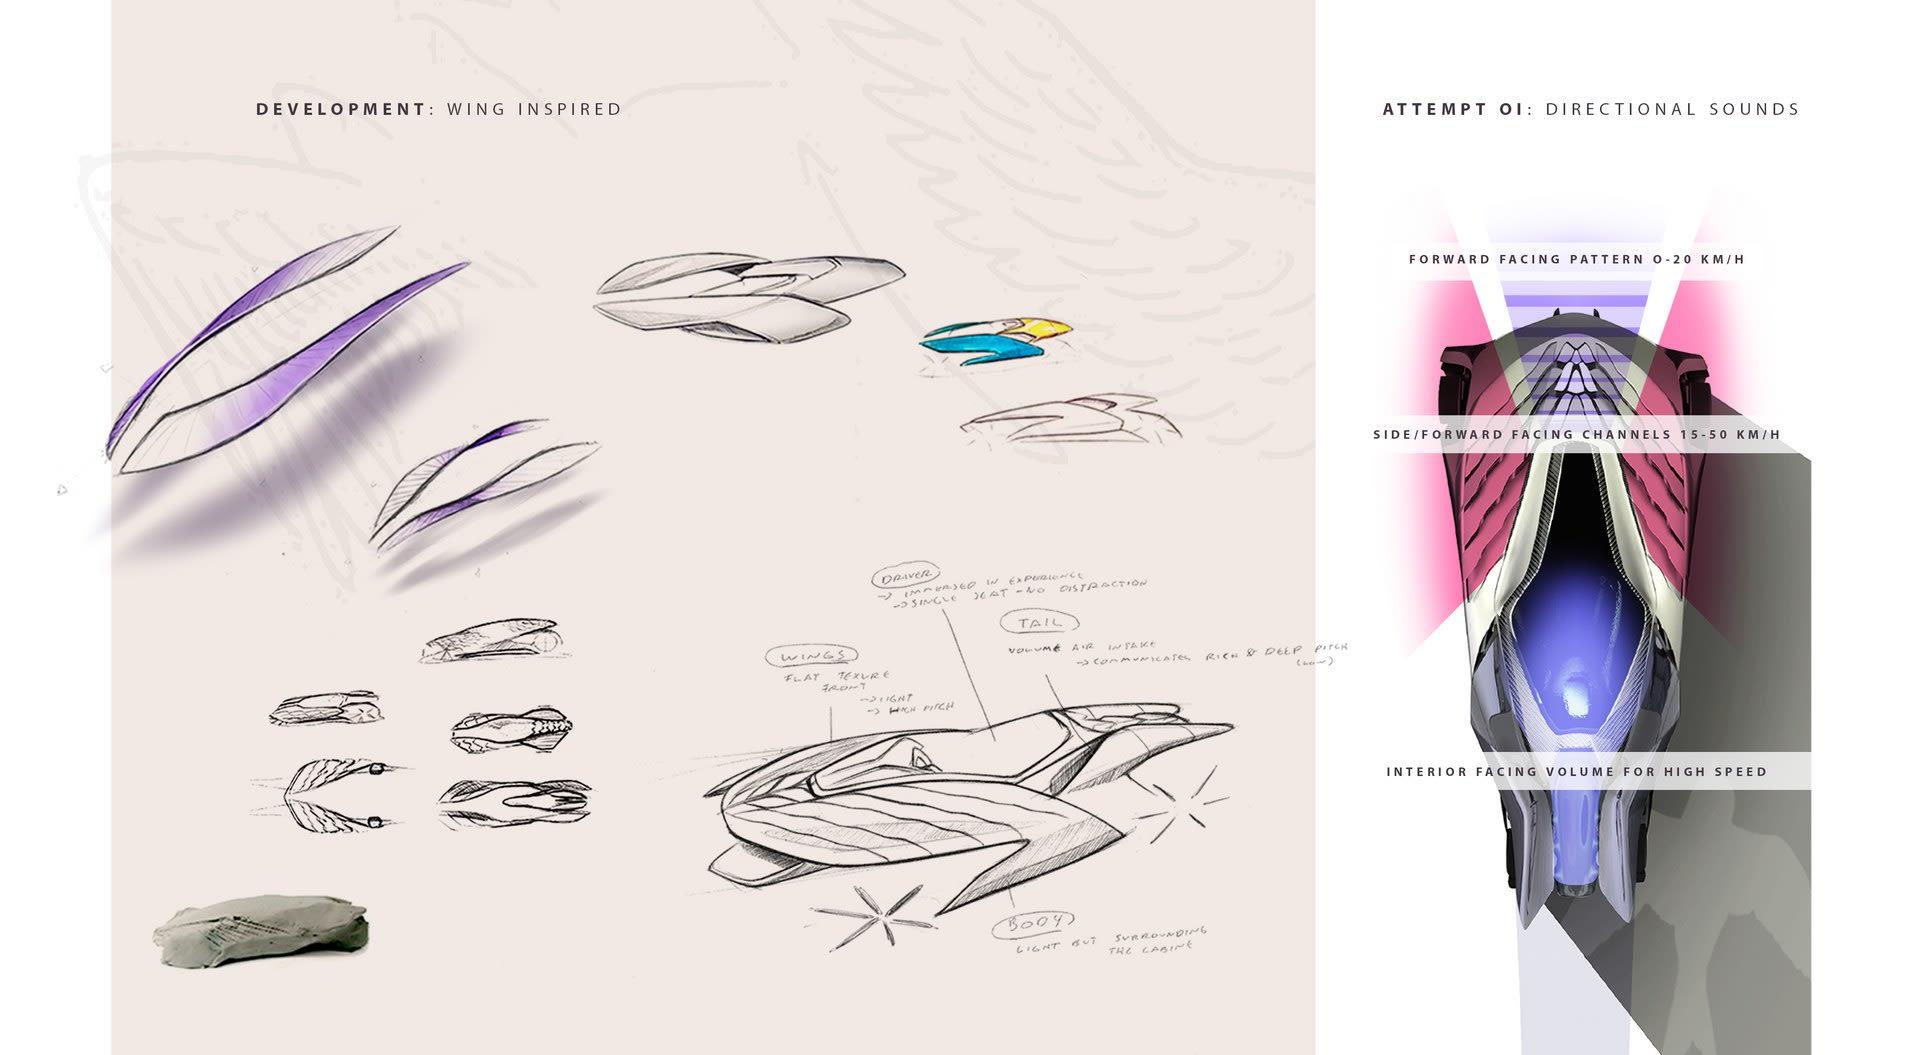 Johannes Recla PURE Sound&Sculpture sketching development